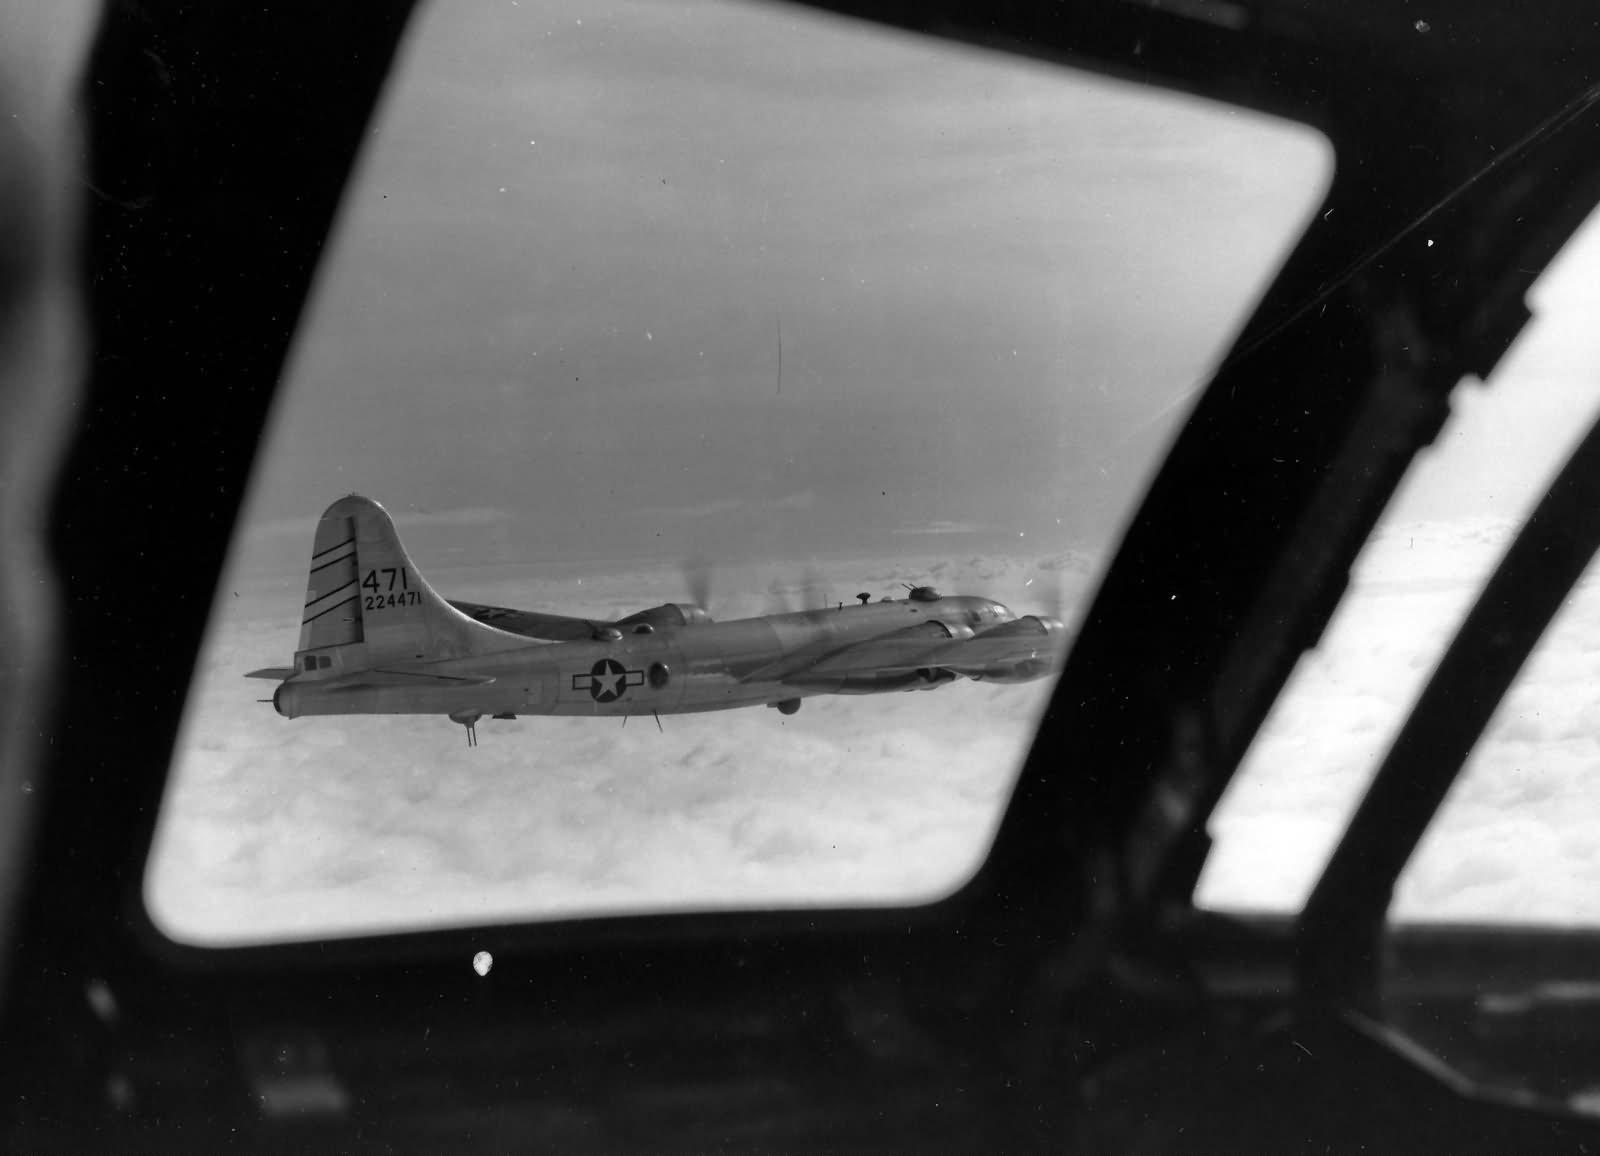 B-29 Superfortress 468th Bomb Group Superfortress 42-24471 Anshan China Raid 1944